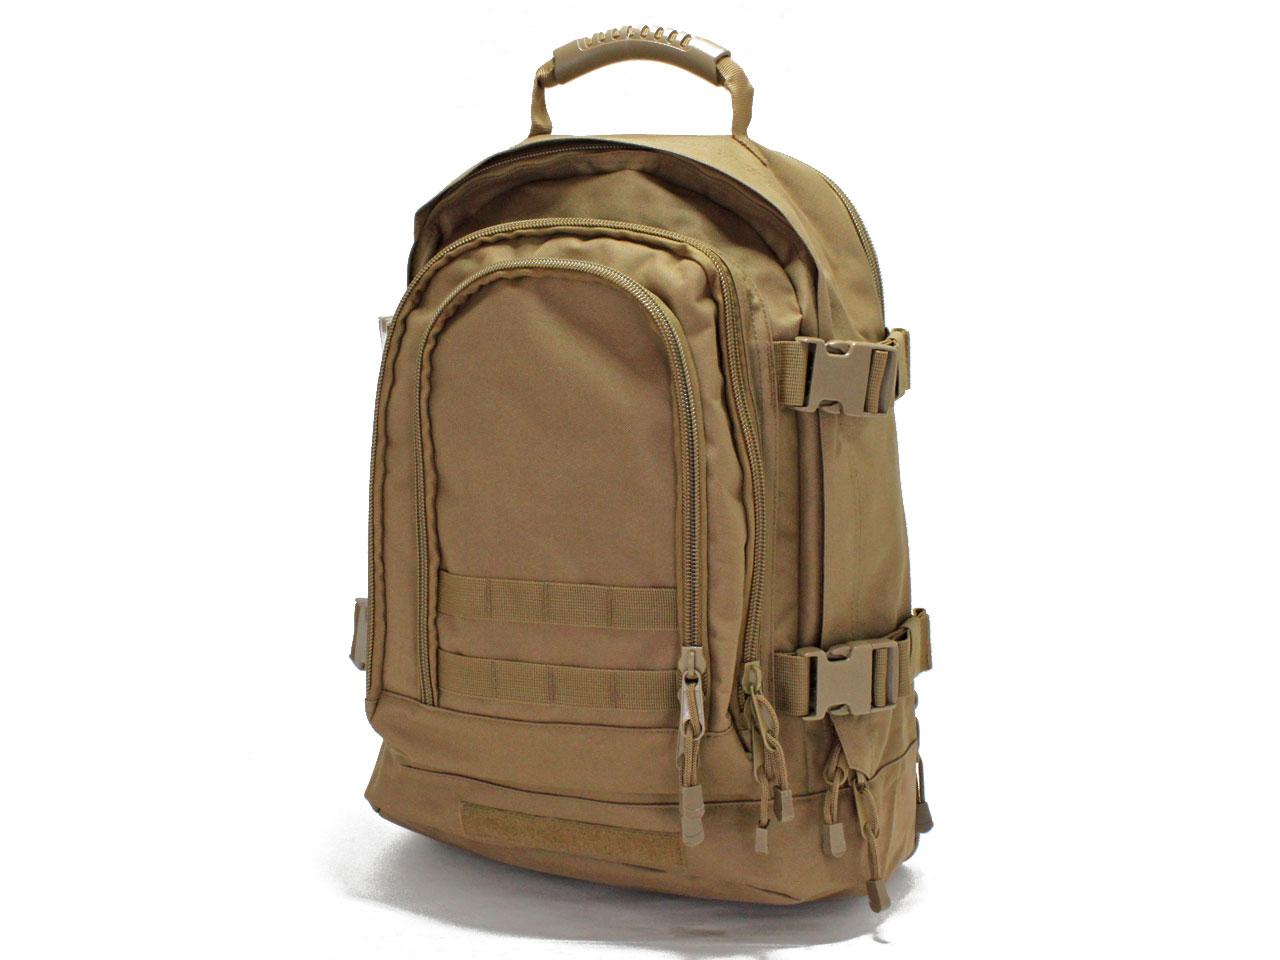 MILITARY【ミリタリー】U.S. MADE NATIONAL GUARD BAG *COYOTE